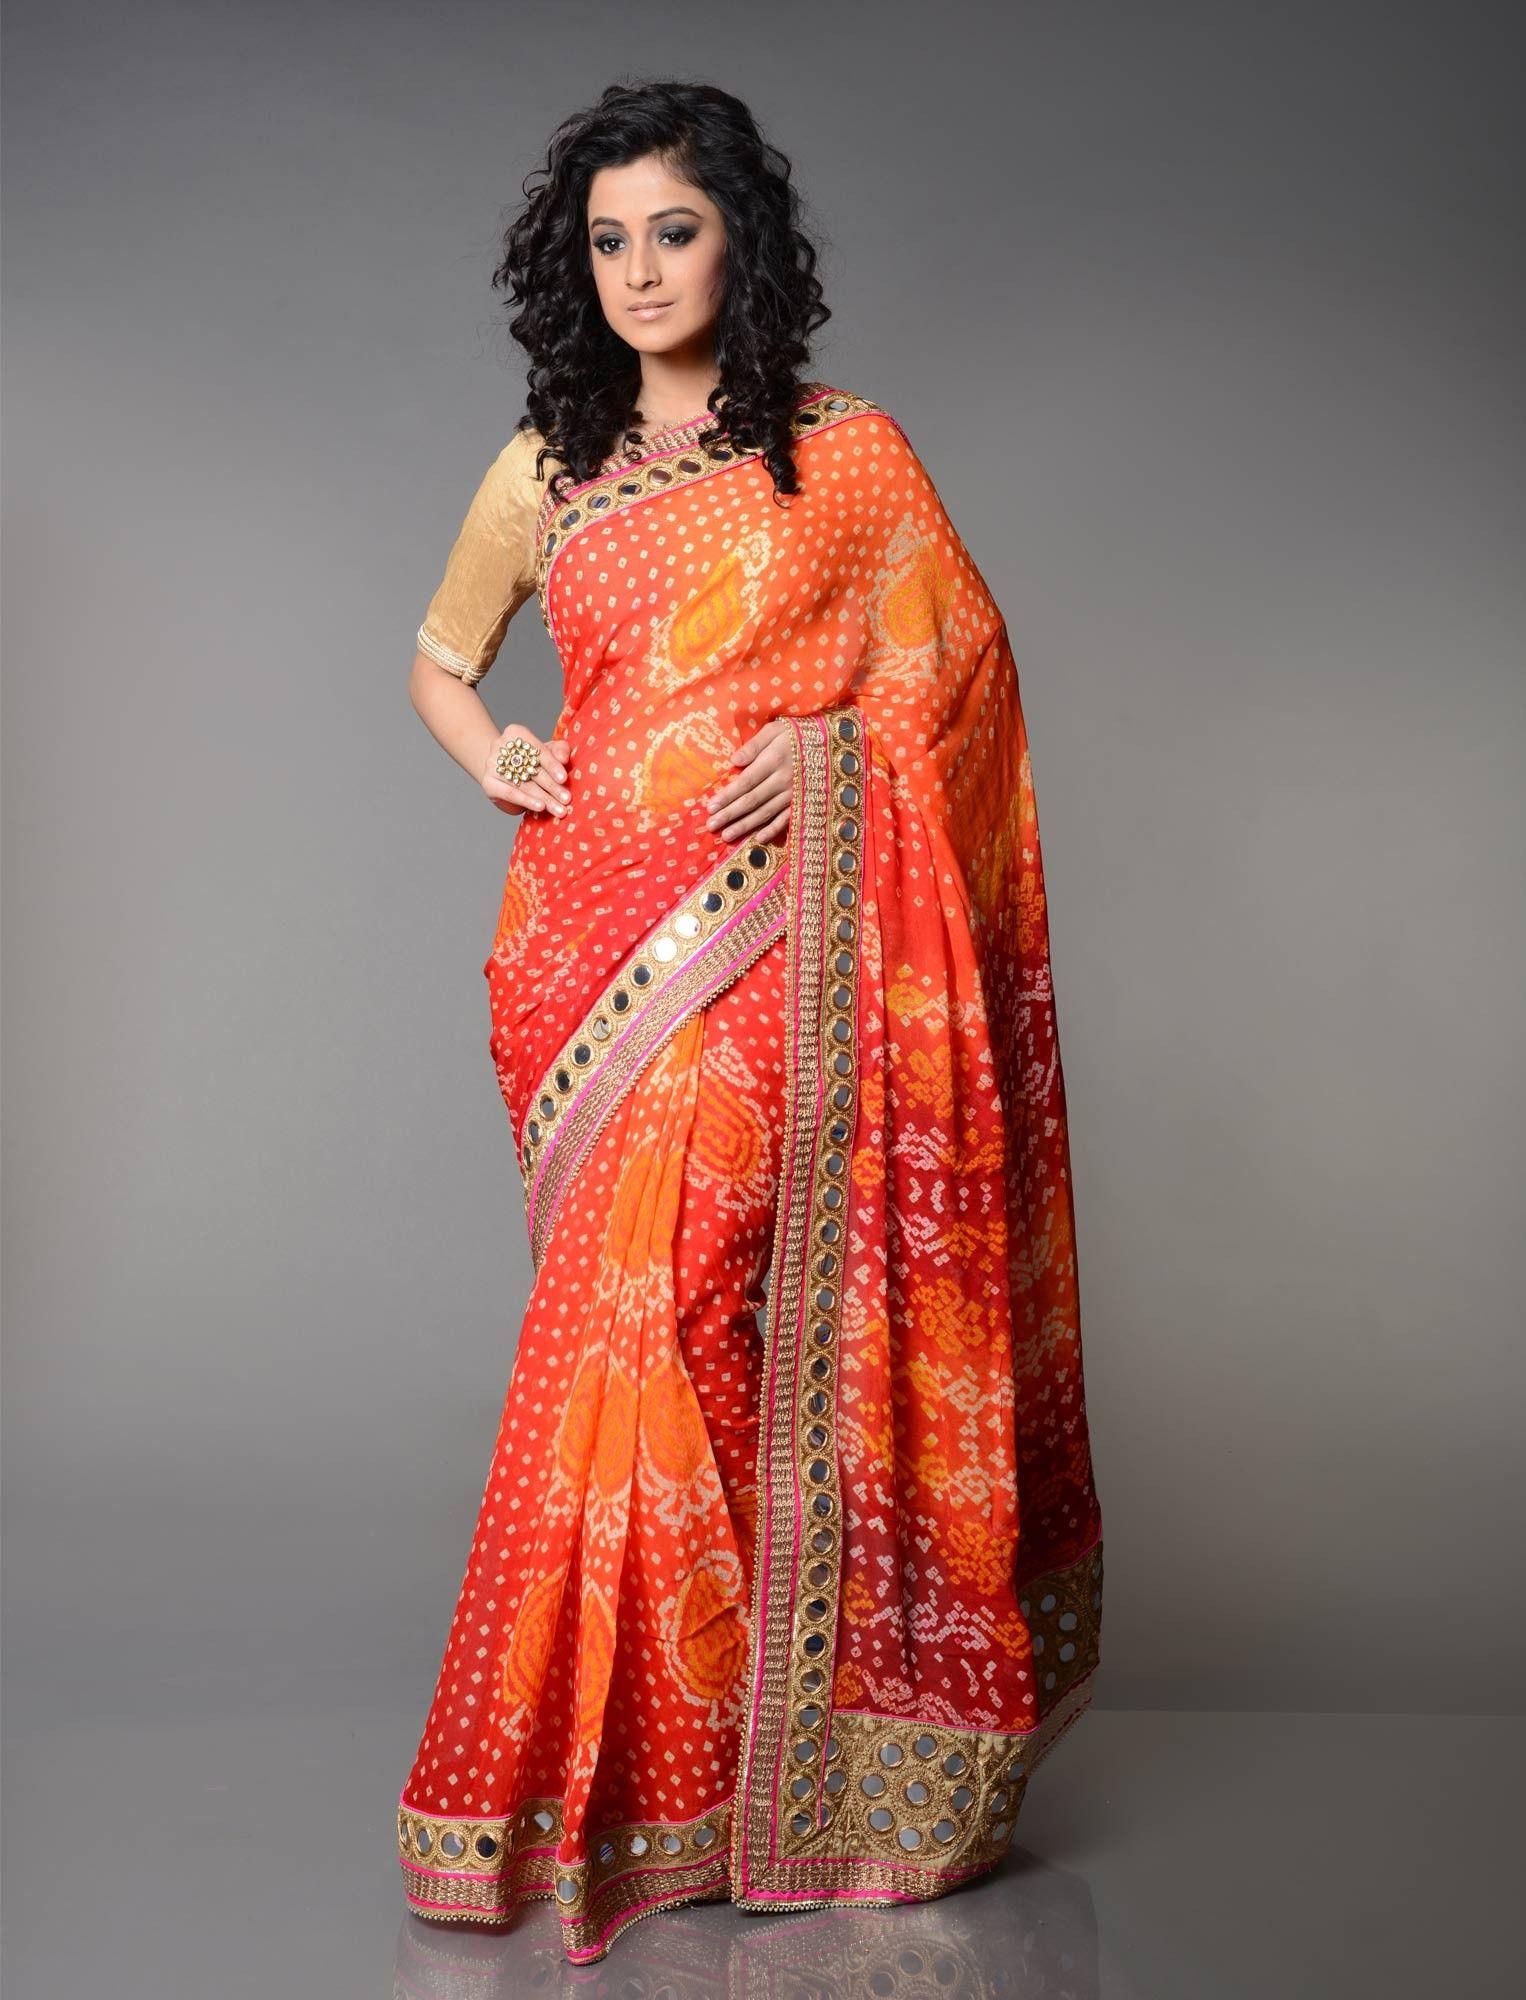 Traditional indian bandhaj Rajasthani Multicolor Bandhani Saree with Blouse Piece  silk saree Regular Unstitched Blouse